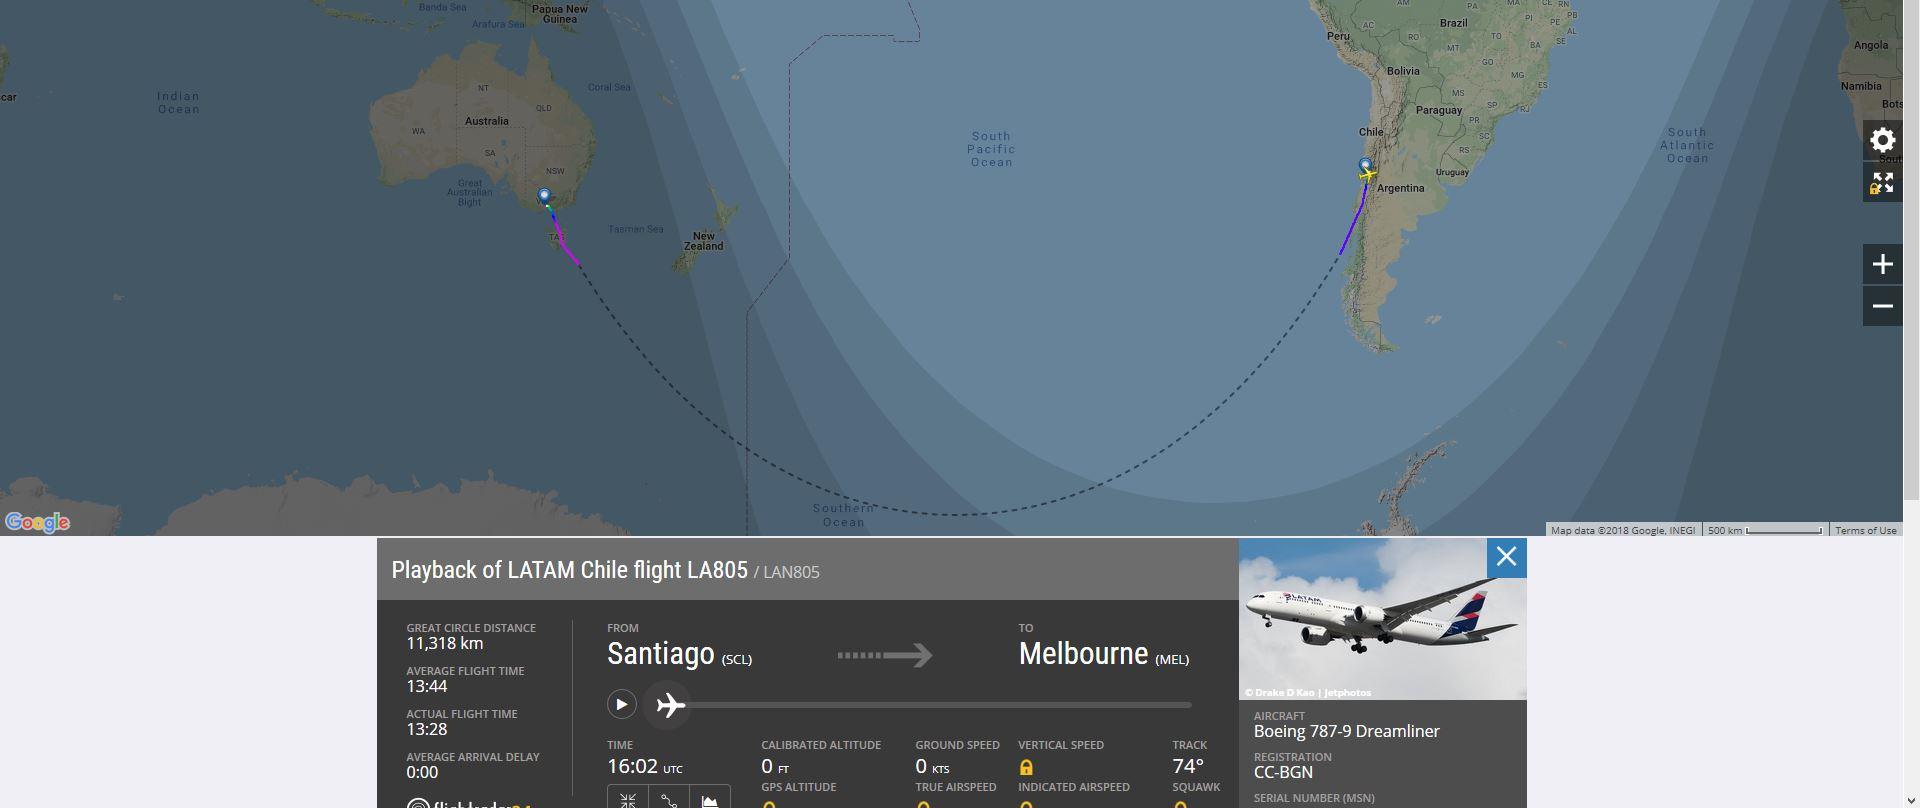 radarvirtuel.com/Flightradar24.com : tous les avions en vol en direct sur une carte - Page 4 Tsge_286